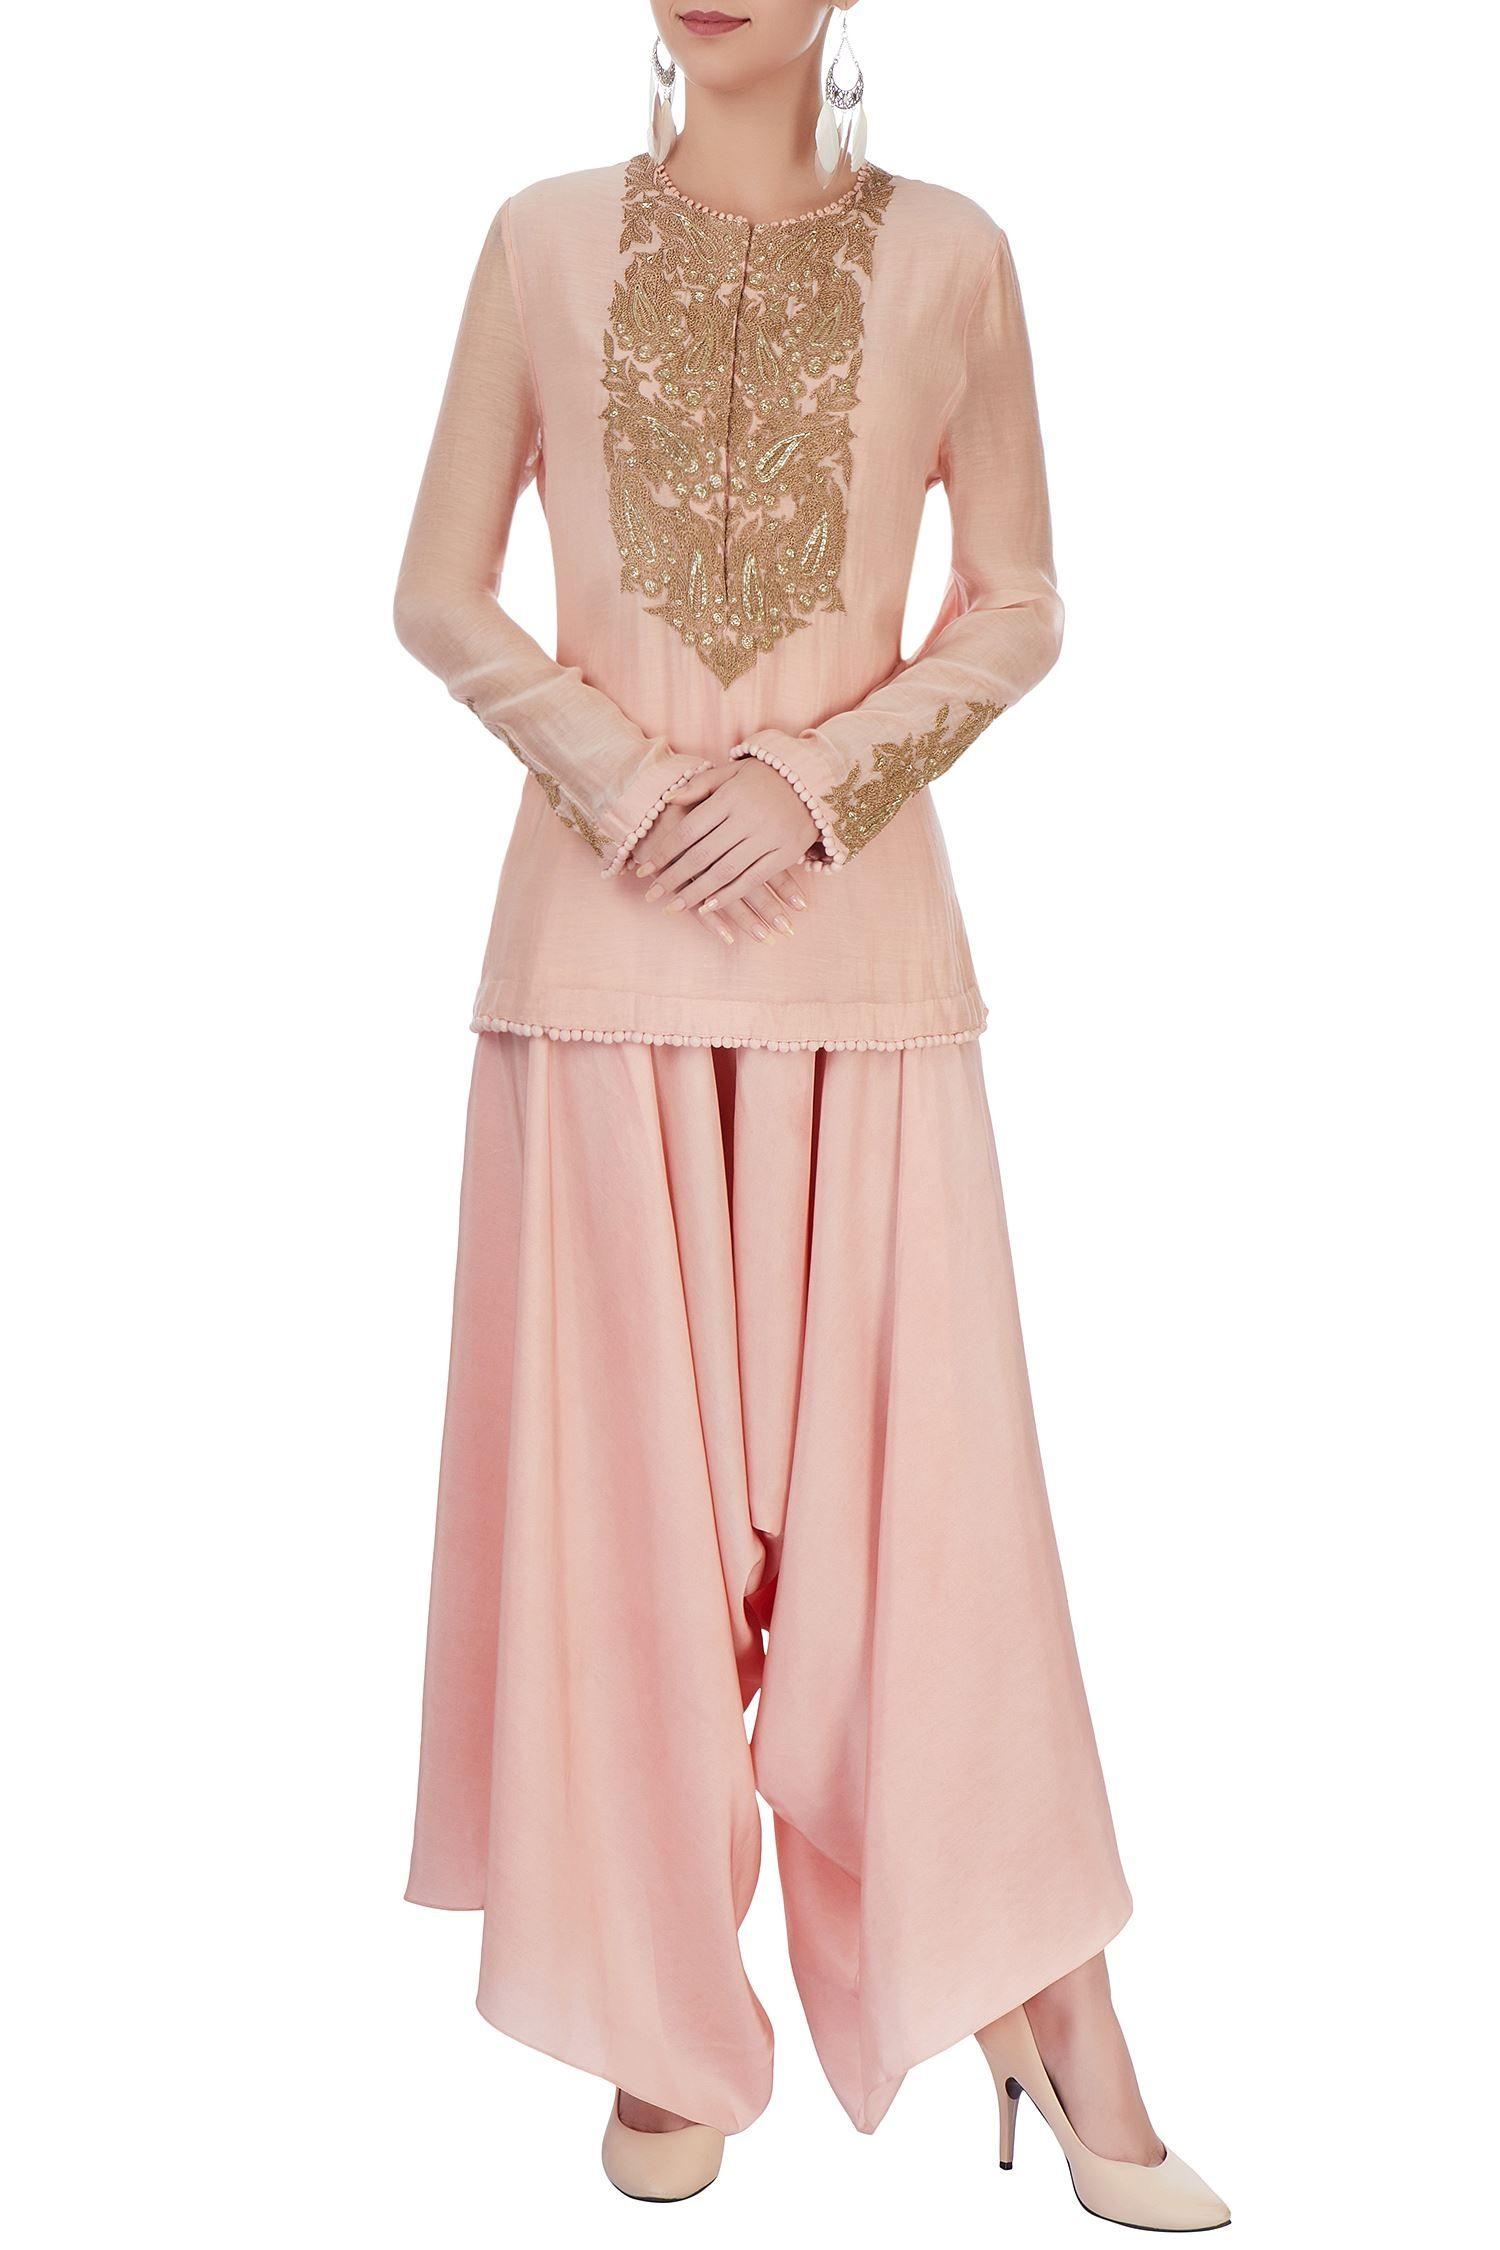 Blush pink kurta set with embroidery | Kurtis /suits | Pinterest ...